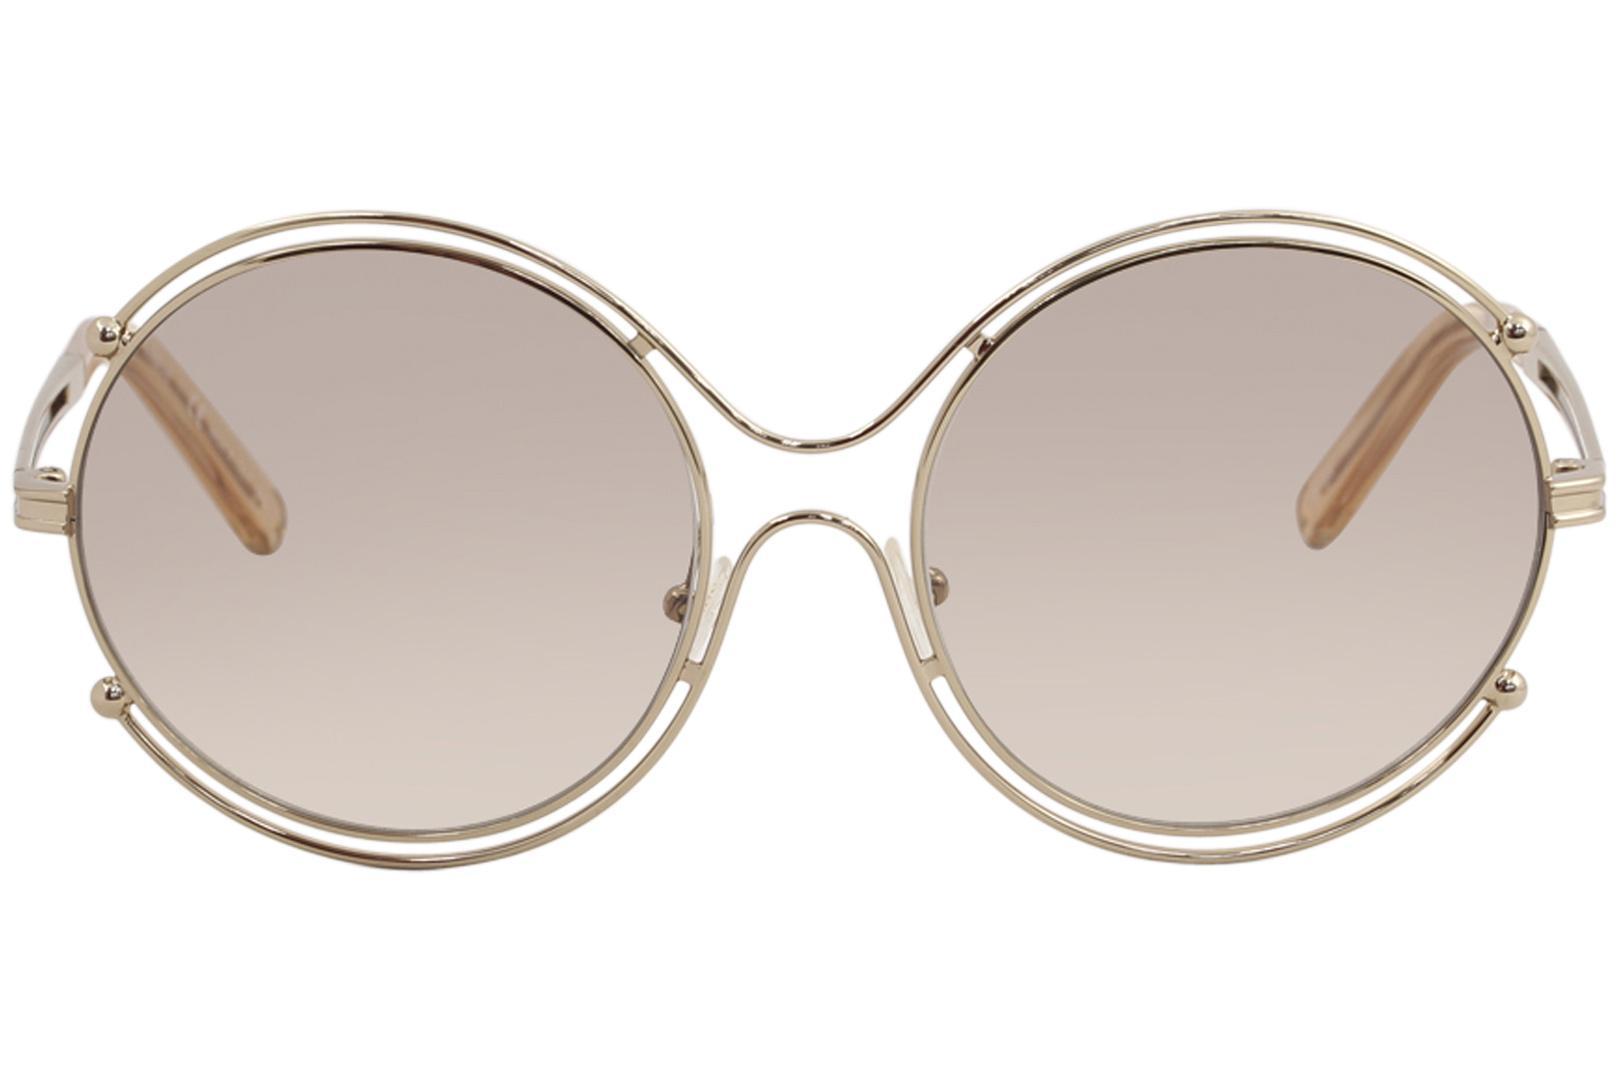 604cede411d8 Chloe Women s CE 122S CE122S Fashion Round Sunglasses